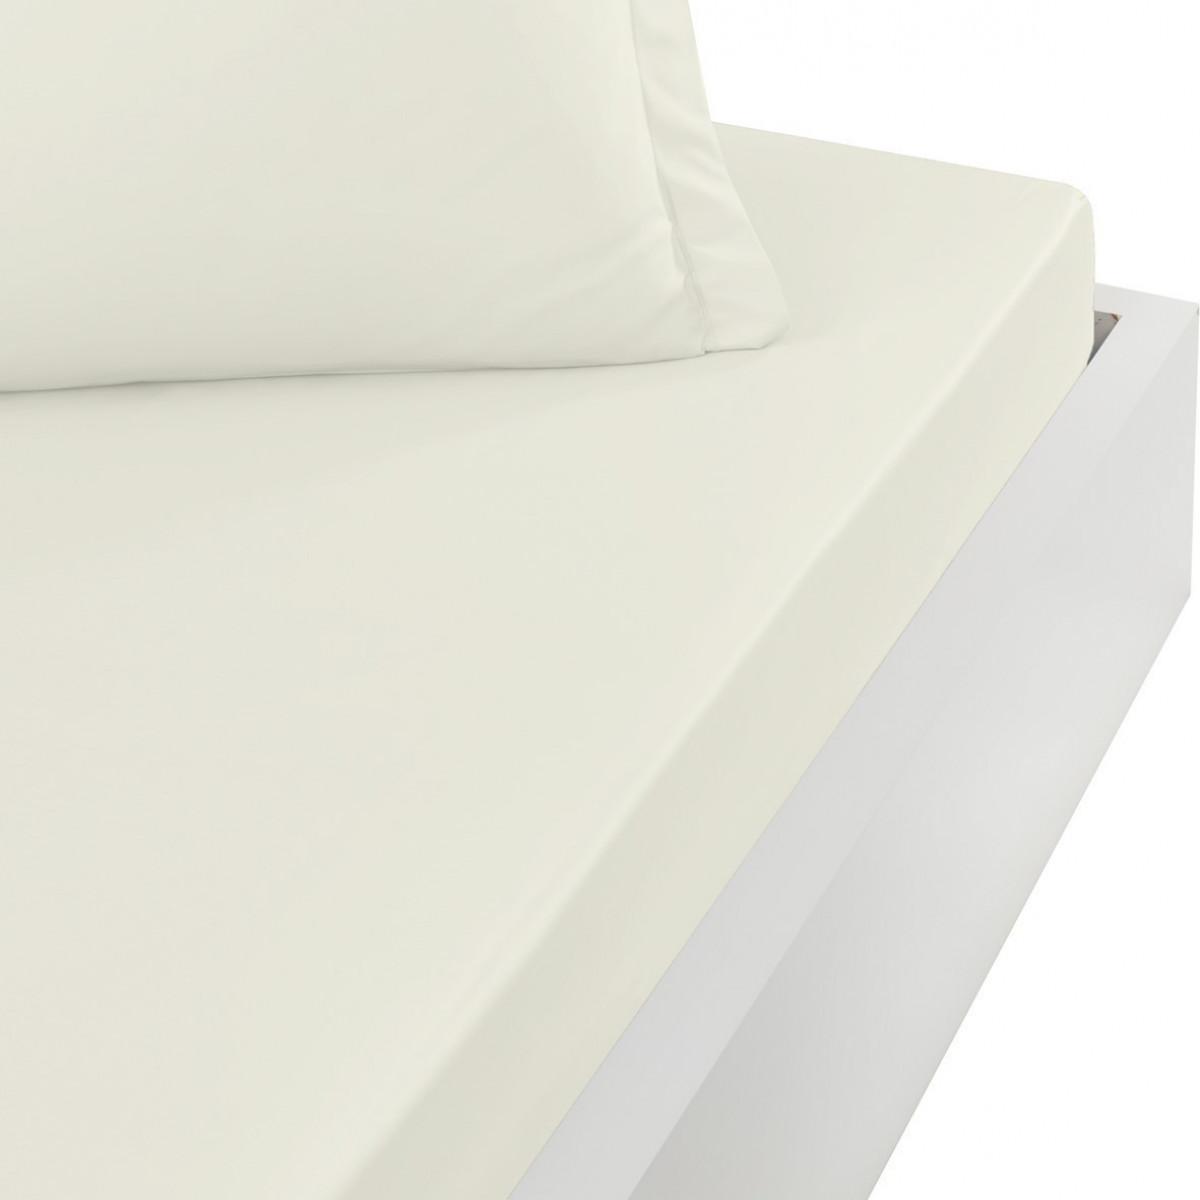 Drap housse en percale de coton bon Ecru 160x200 cm